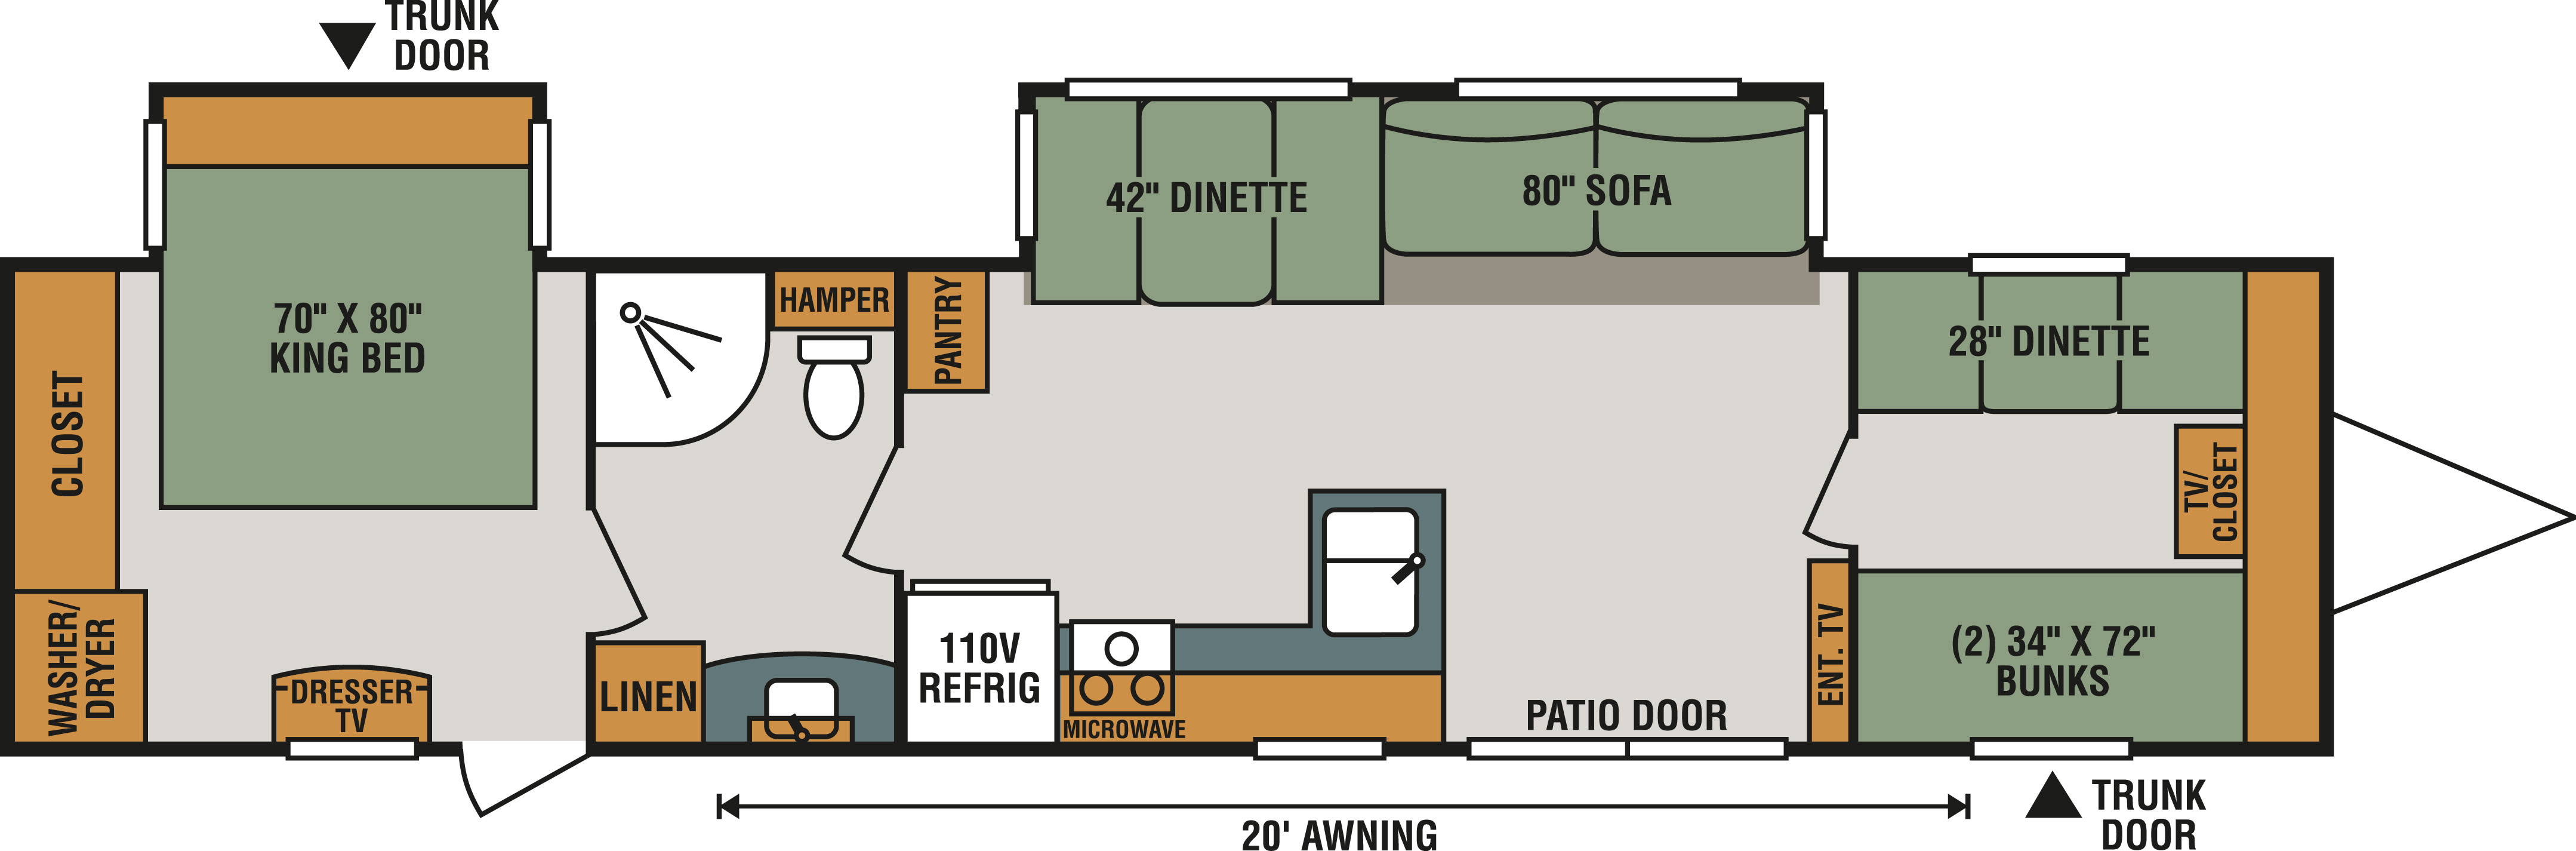 Kodiak Travel Trailer Floor Plans Photo Aerolite Floor Plans Images Kodiak Rv Floor Plans